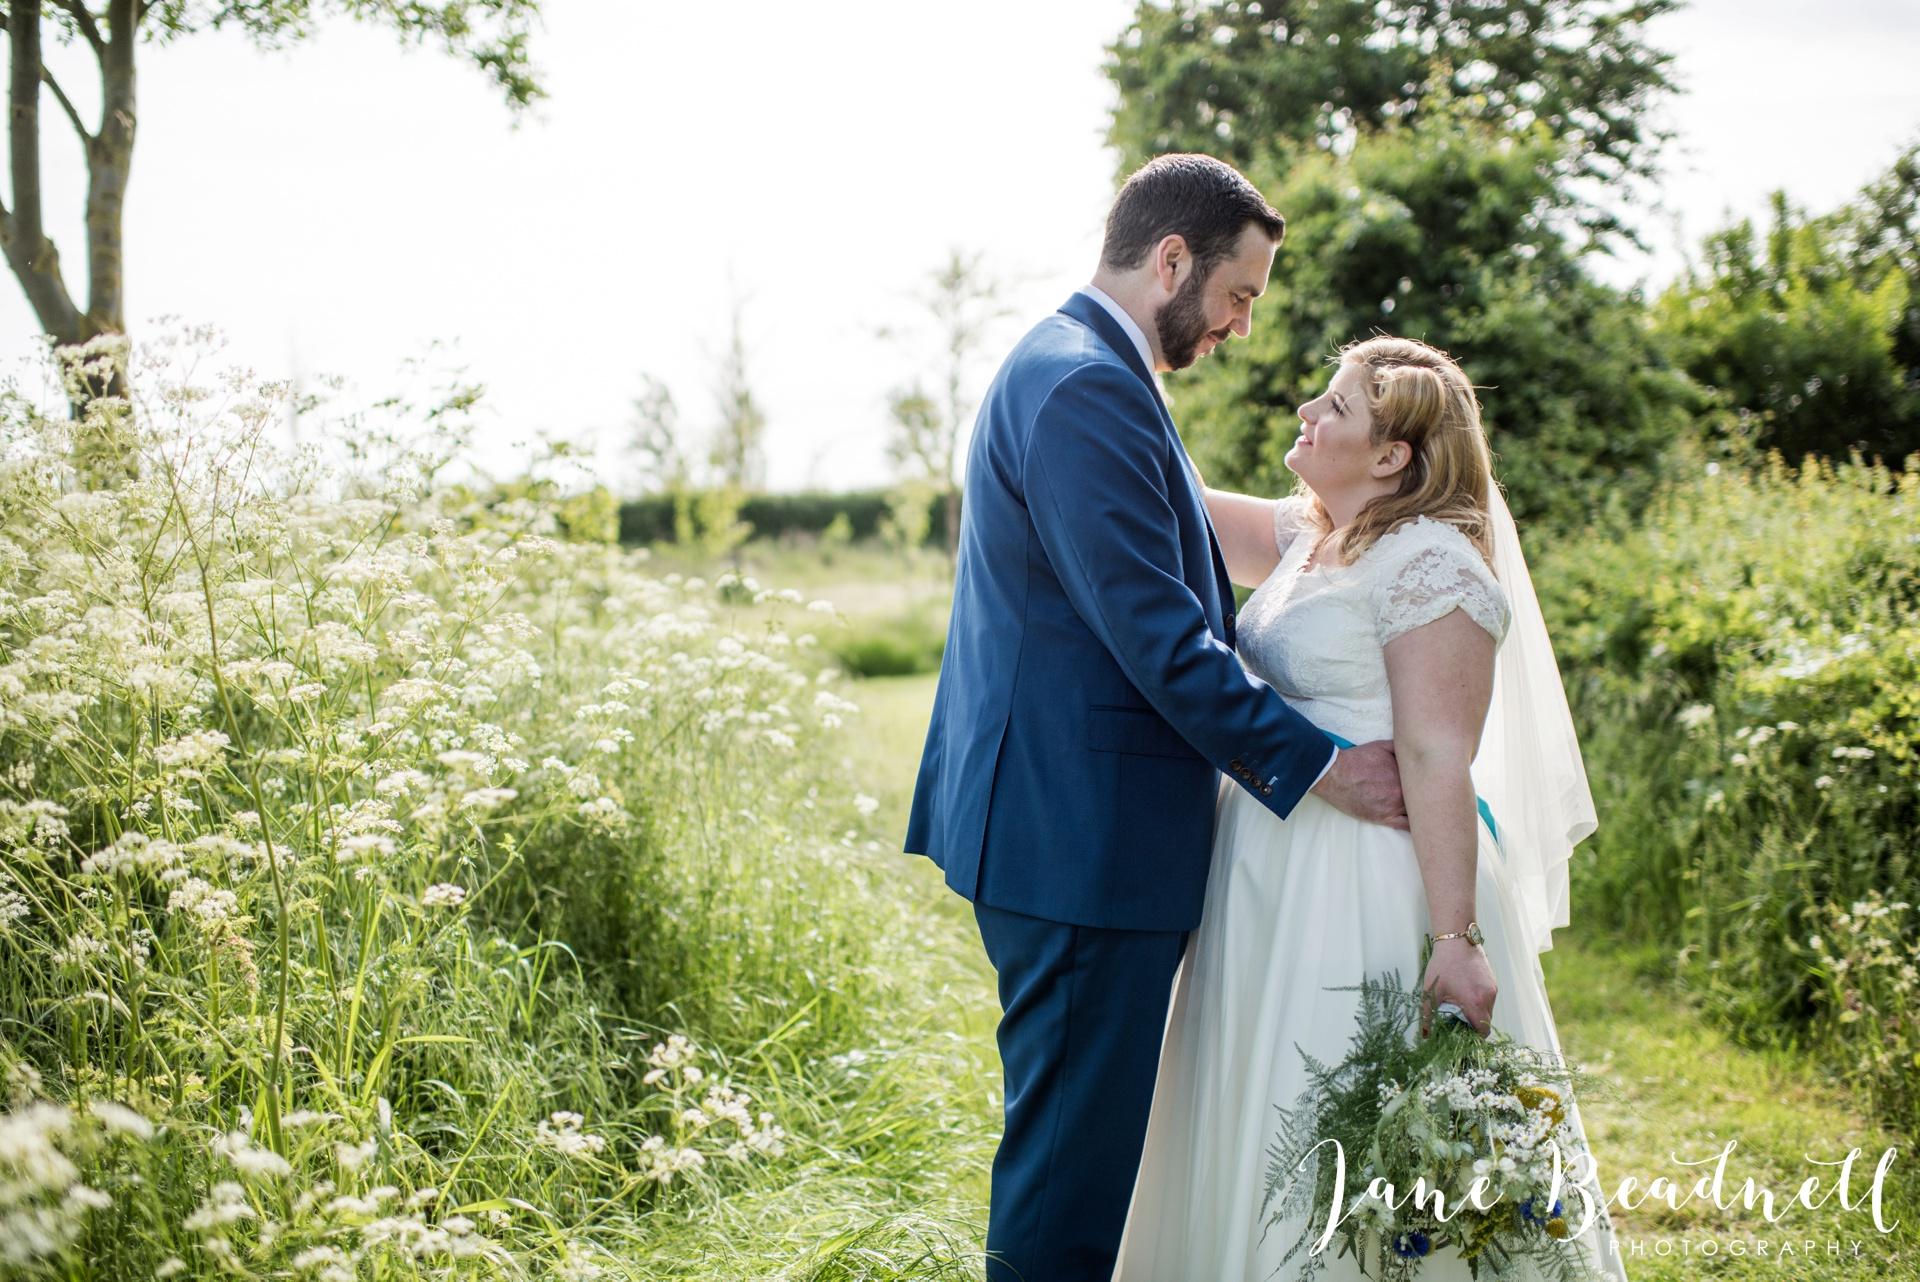 South Farm Wedding photography Hertfordshire by Jane Beadnell Photography fine art wedding photographer_0132